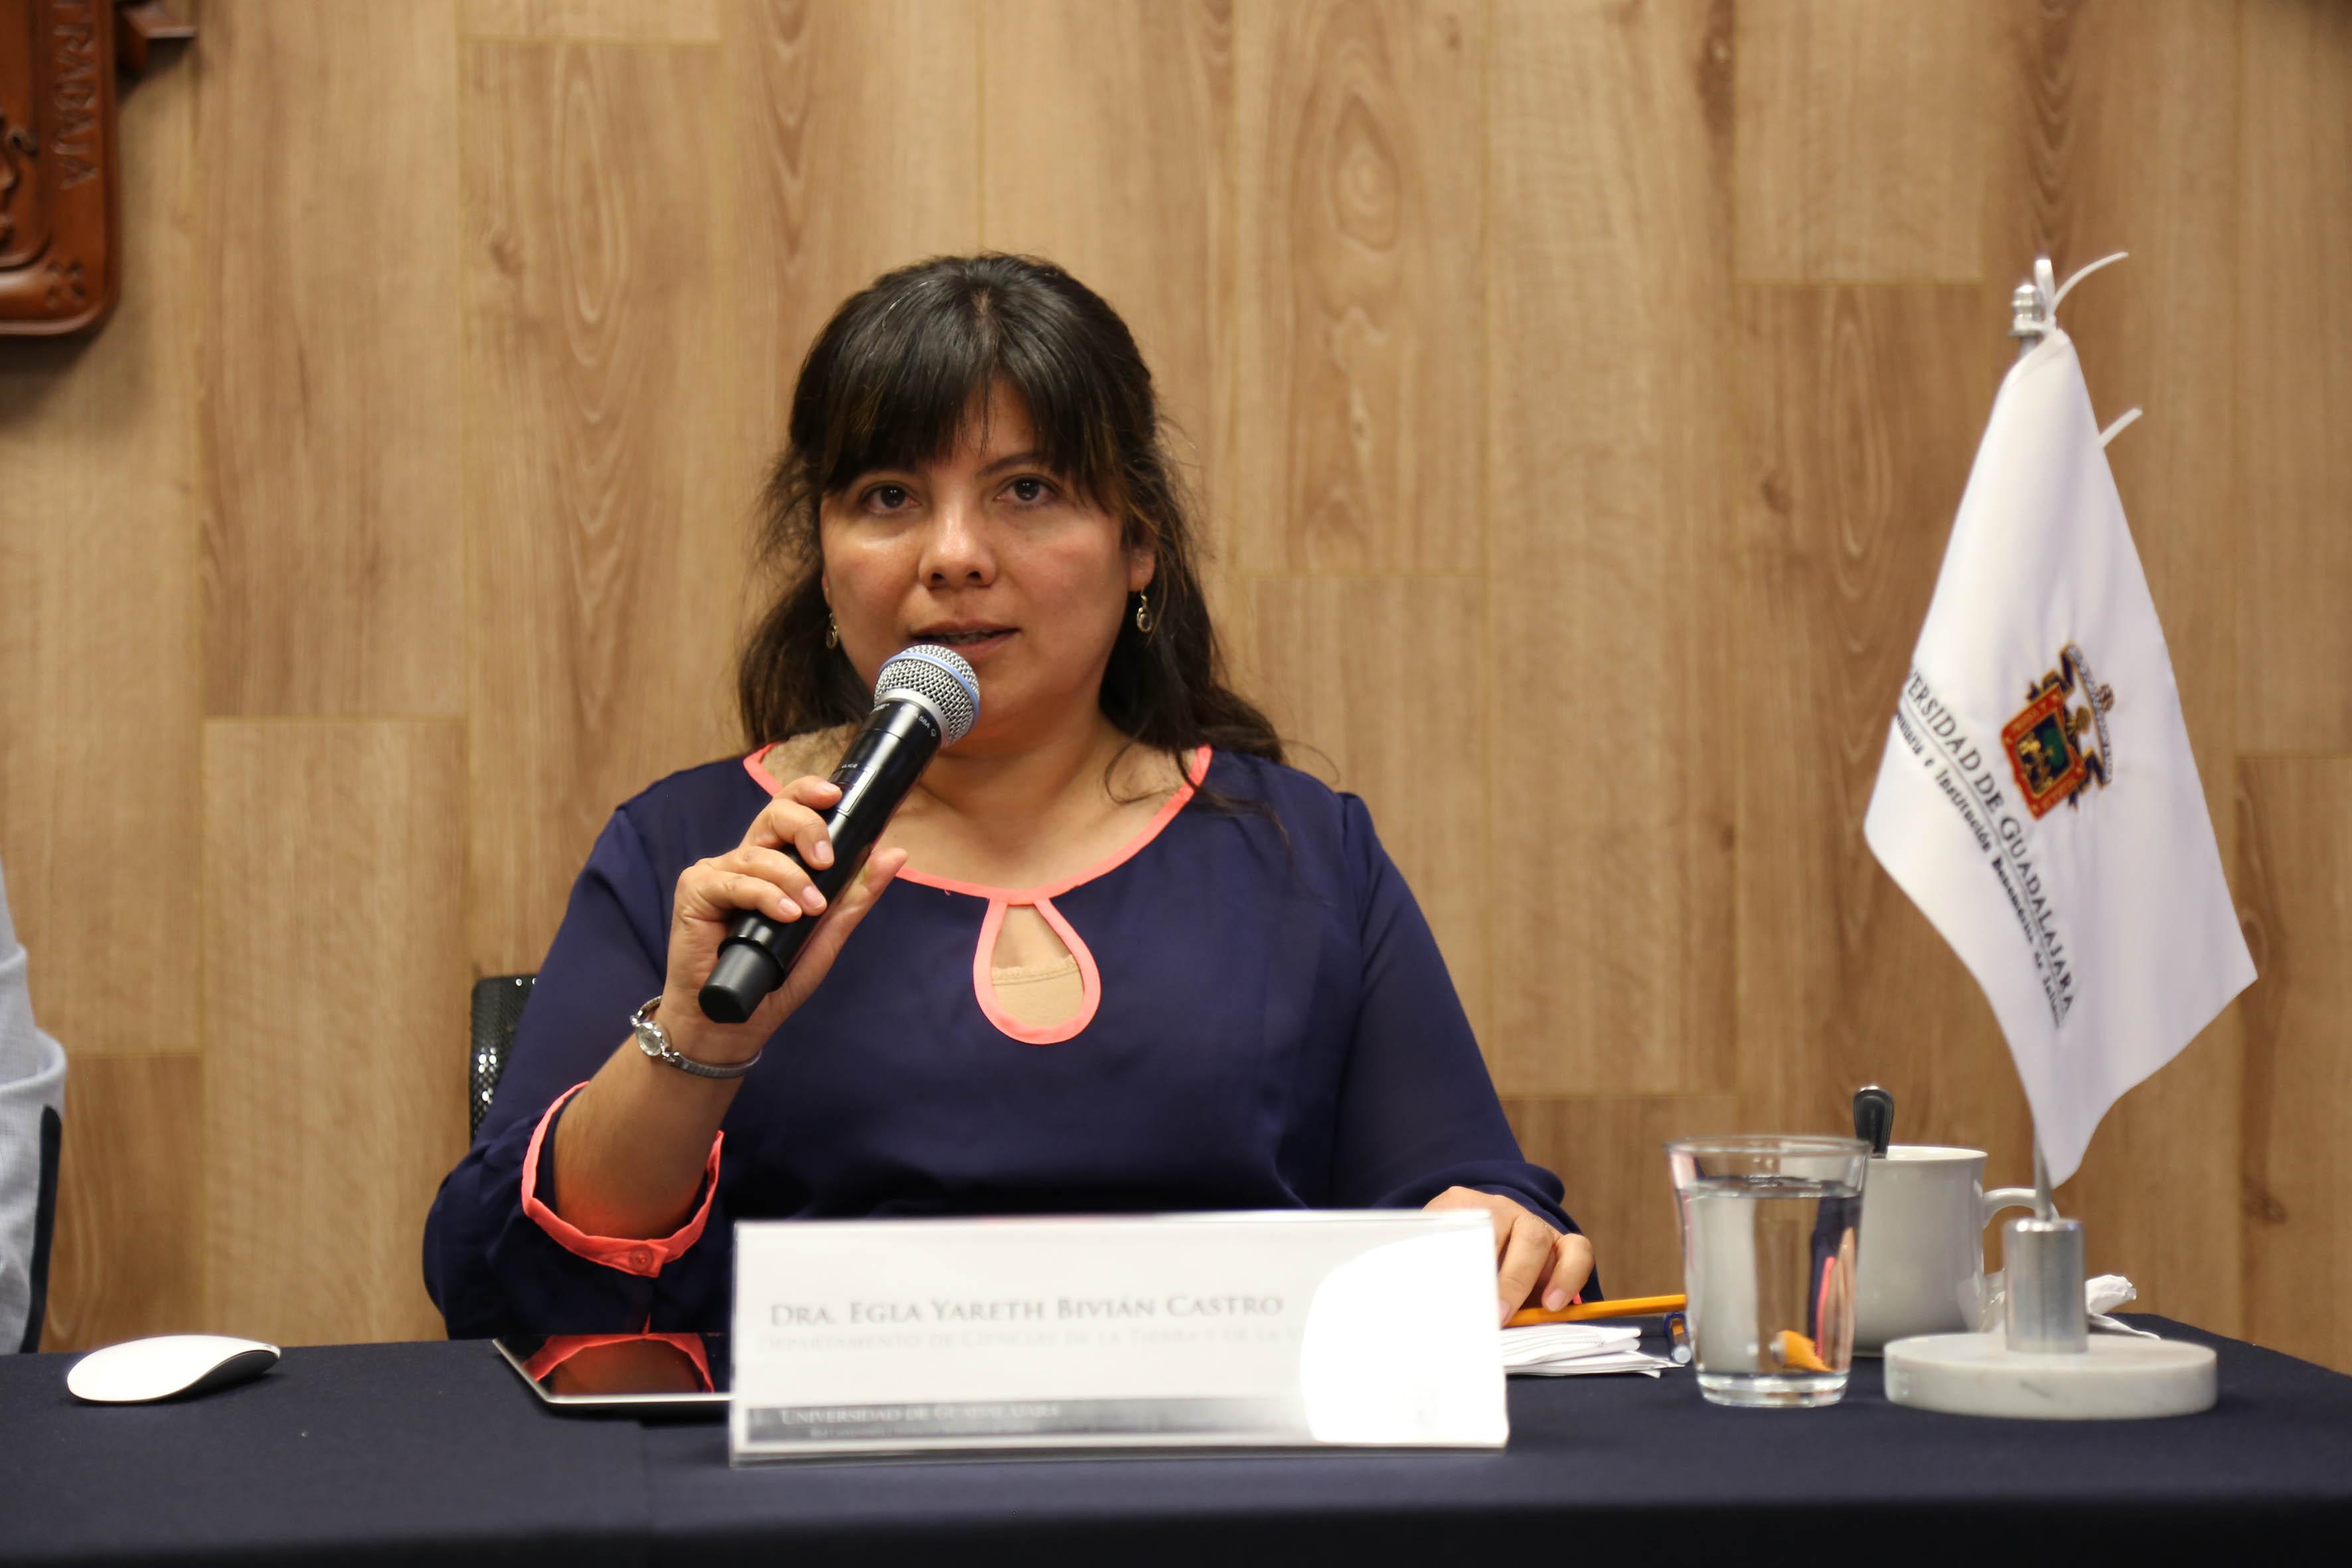 Dra. Egla Yareth Bivián Castro